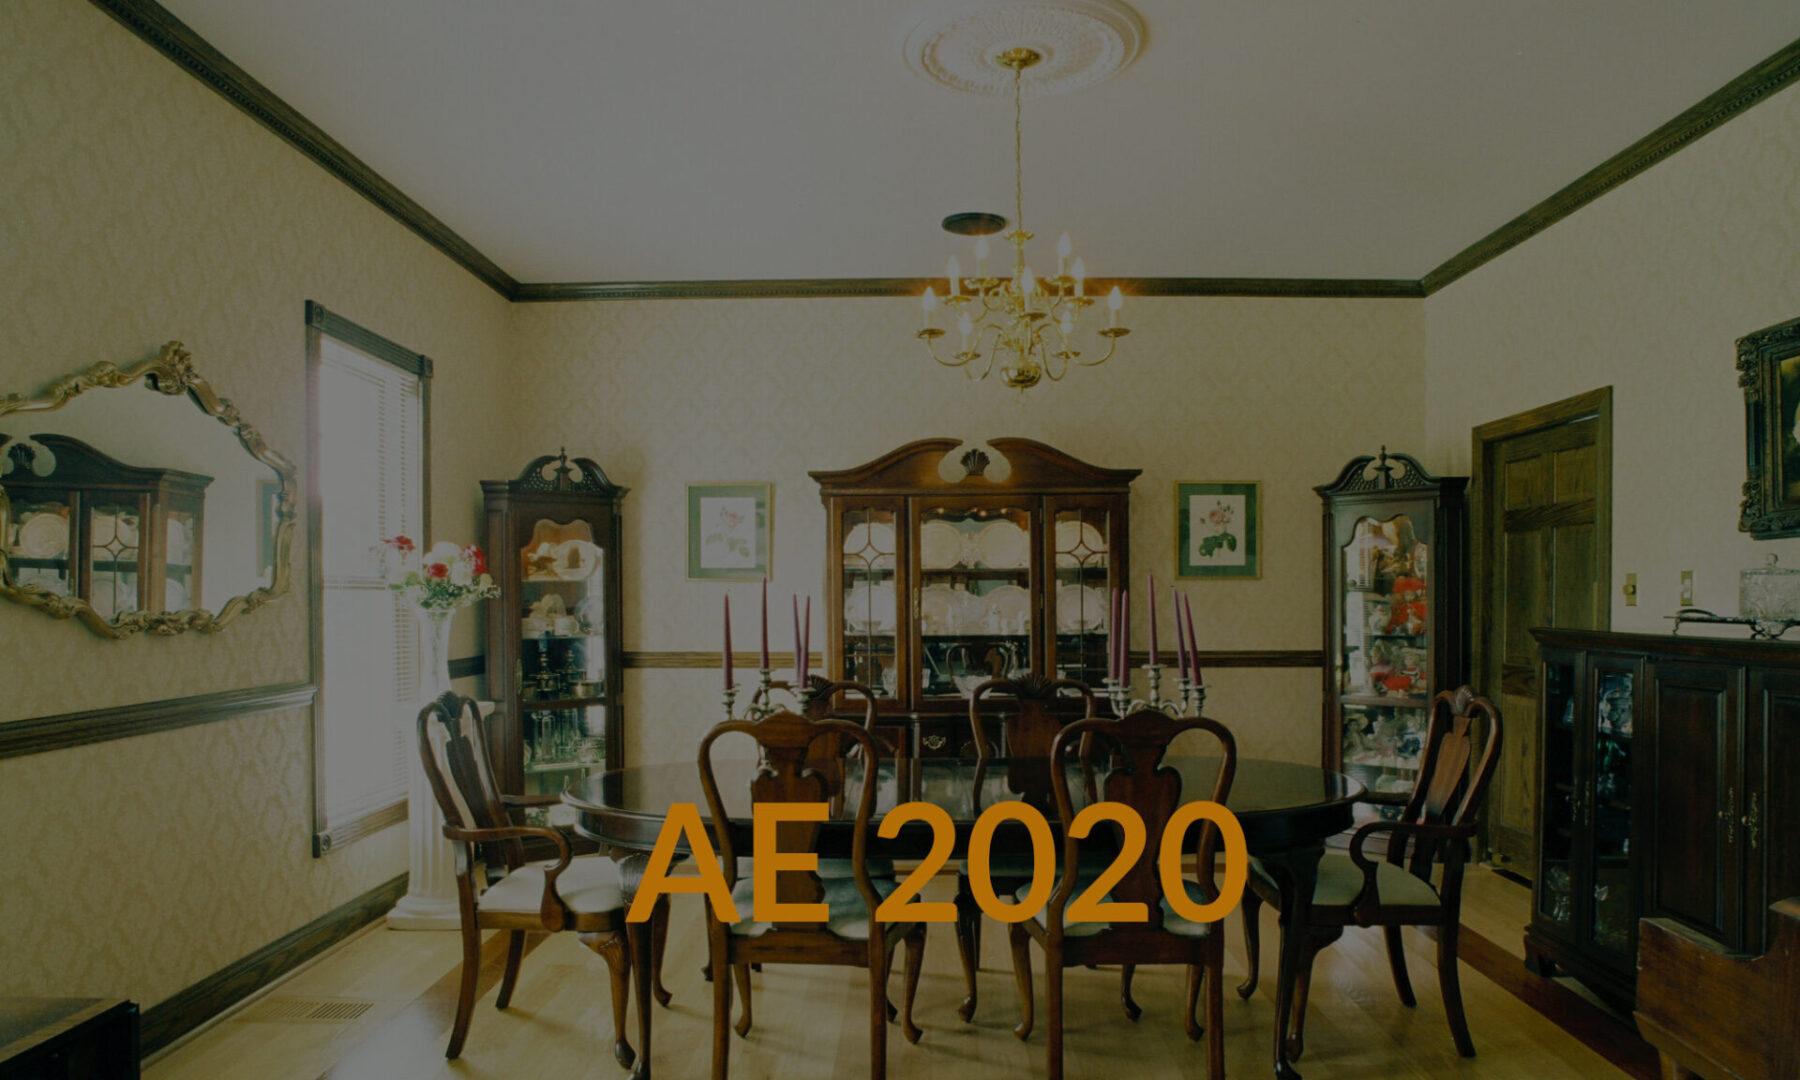 AE_2020_VC_Full_size_header